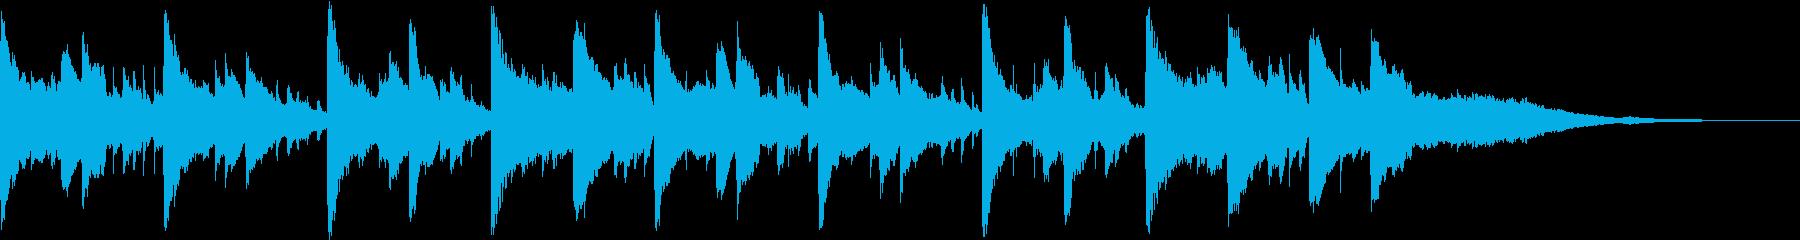 CMに 優しいアコギ&ピアノのBGMの再生済みの波形